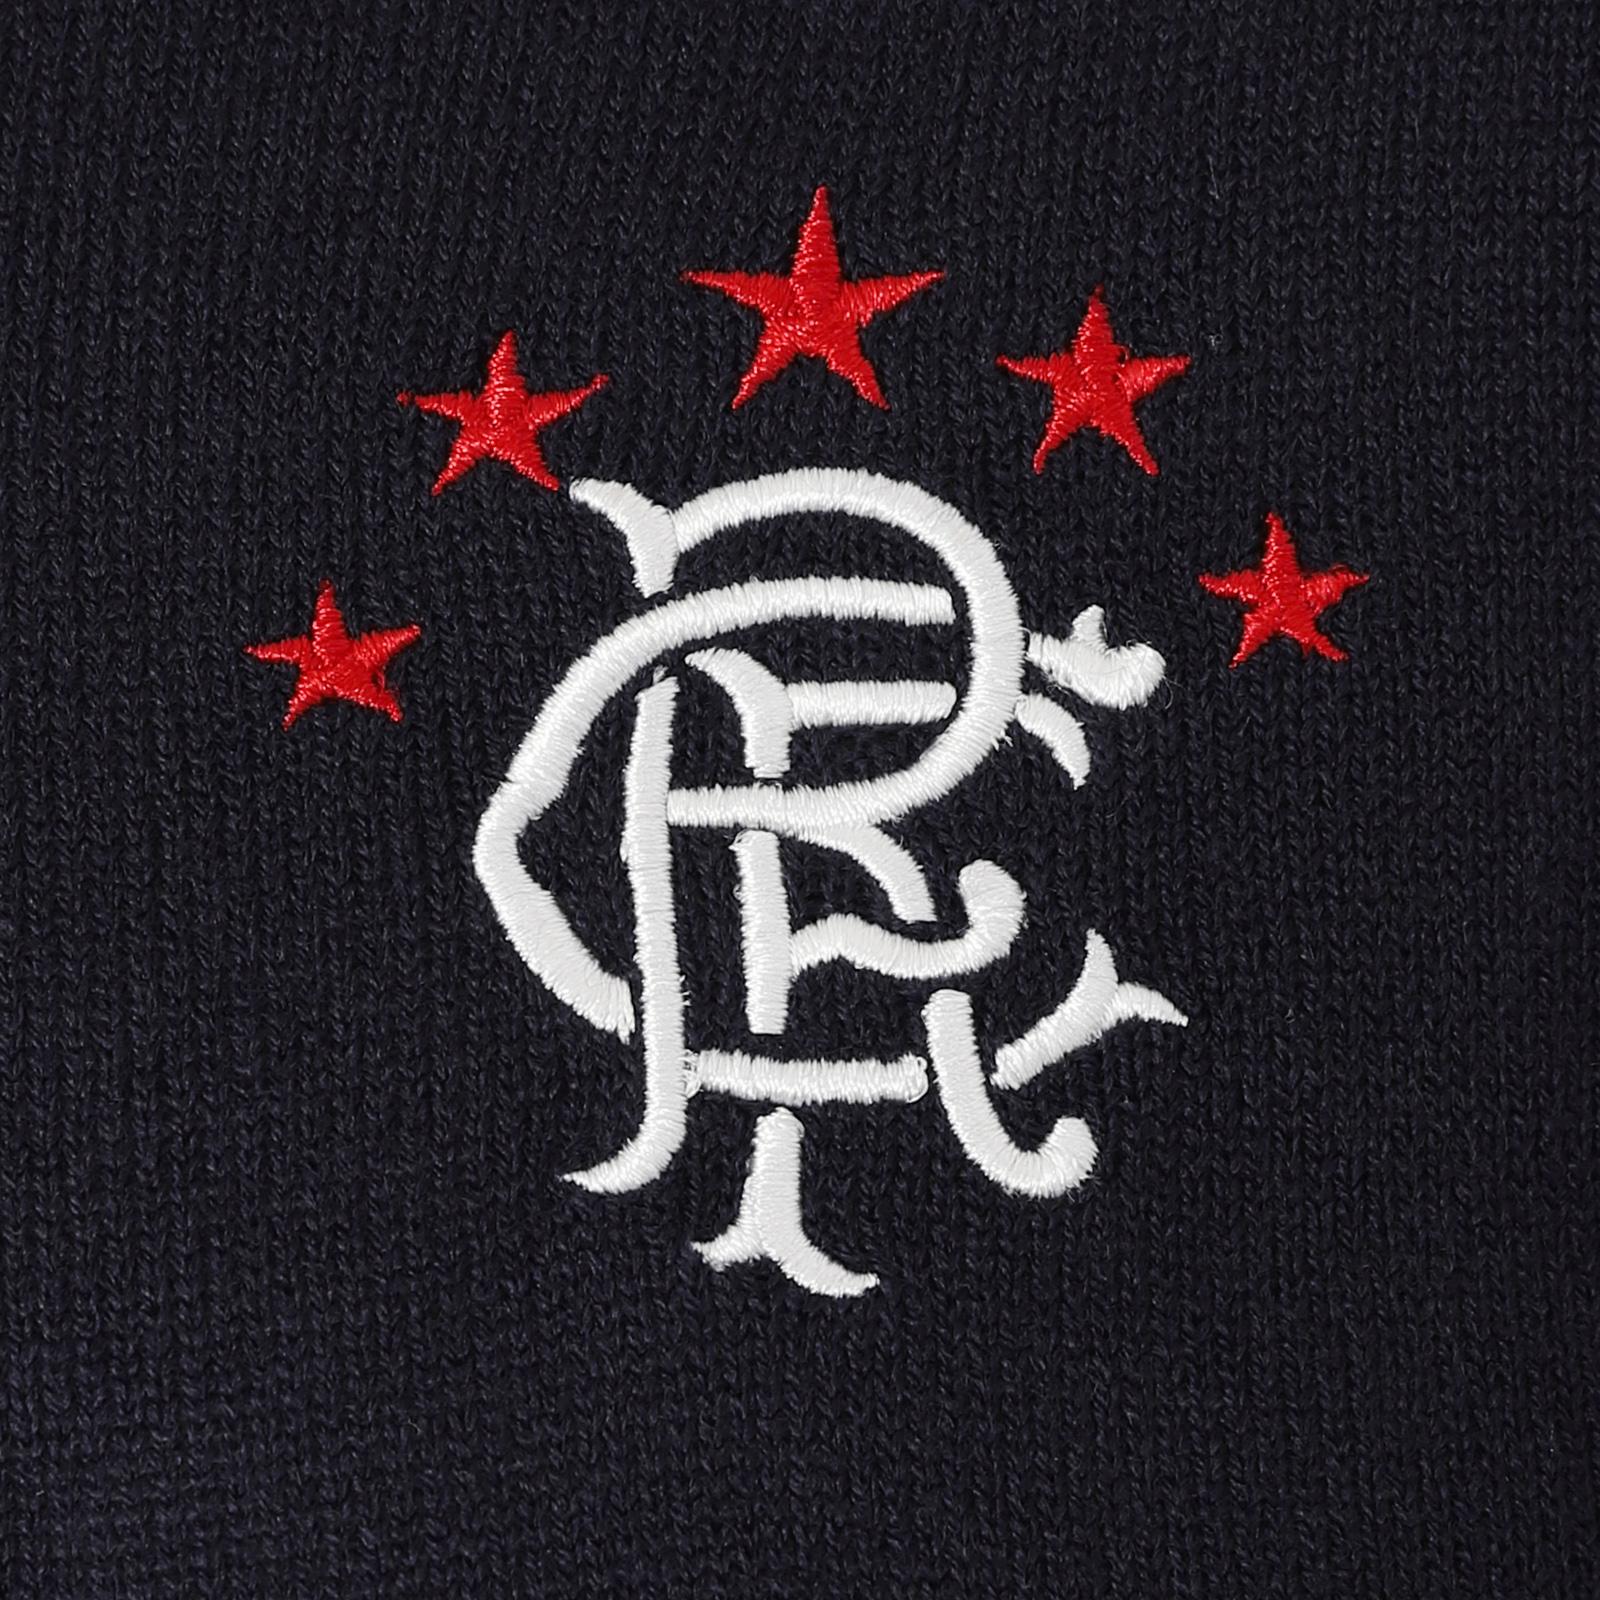 Rangers Football Club Official Soccer Gift Mens Crest Knitted Jumper